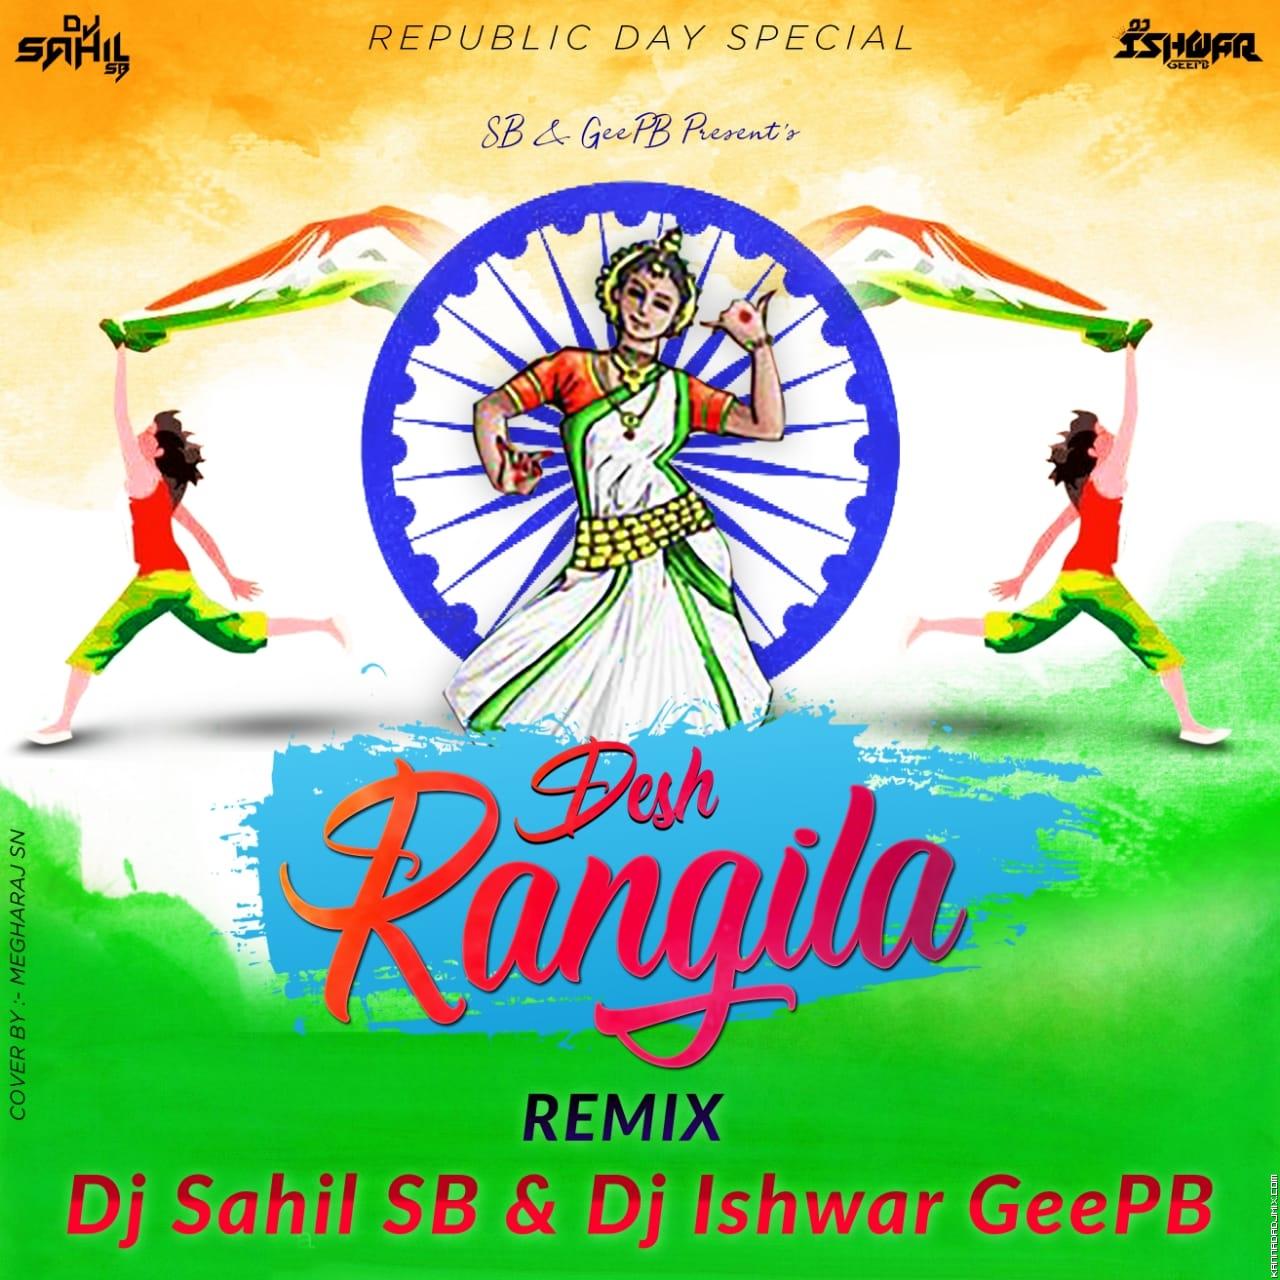 DESH_RANGILA_REMIX_DJ_SAHIL_SB_x_DJ_ISHWAR_GeePB.mp3